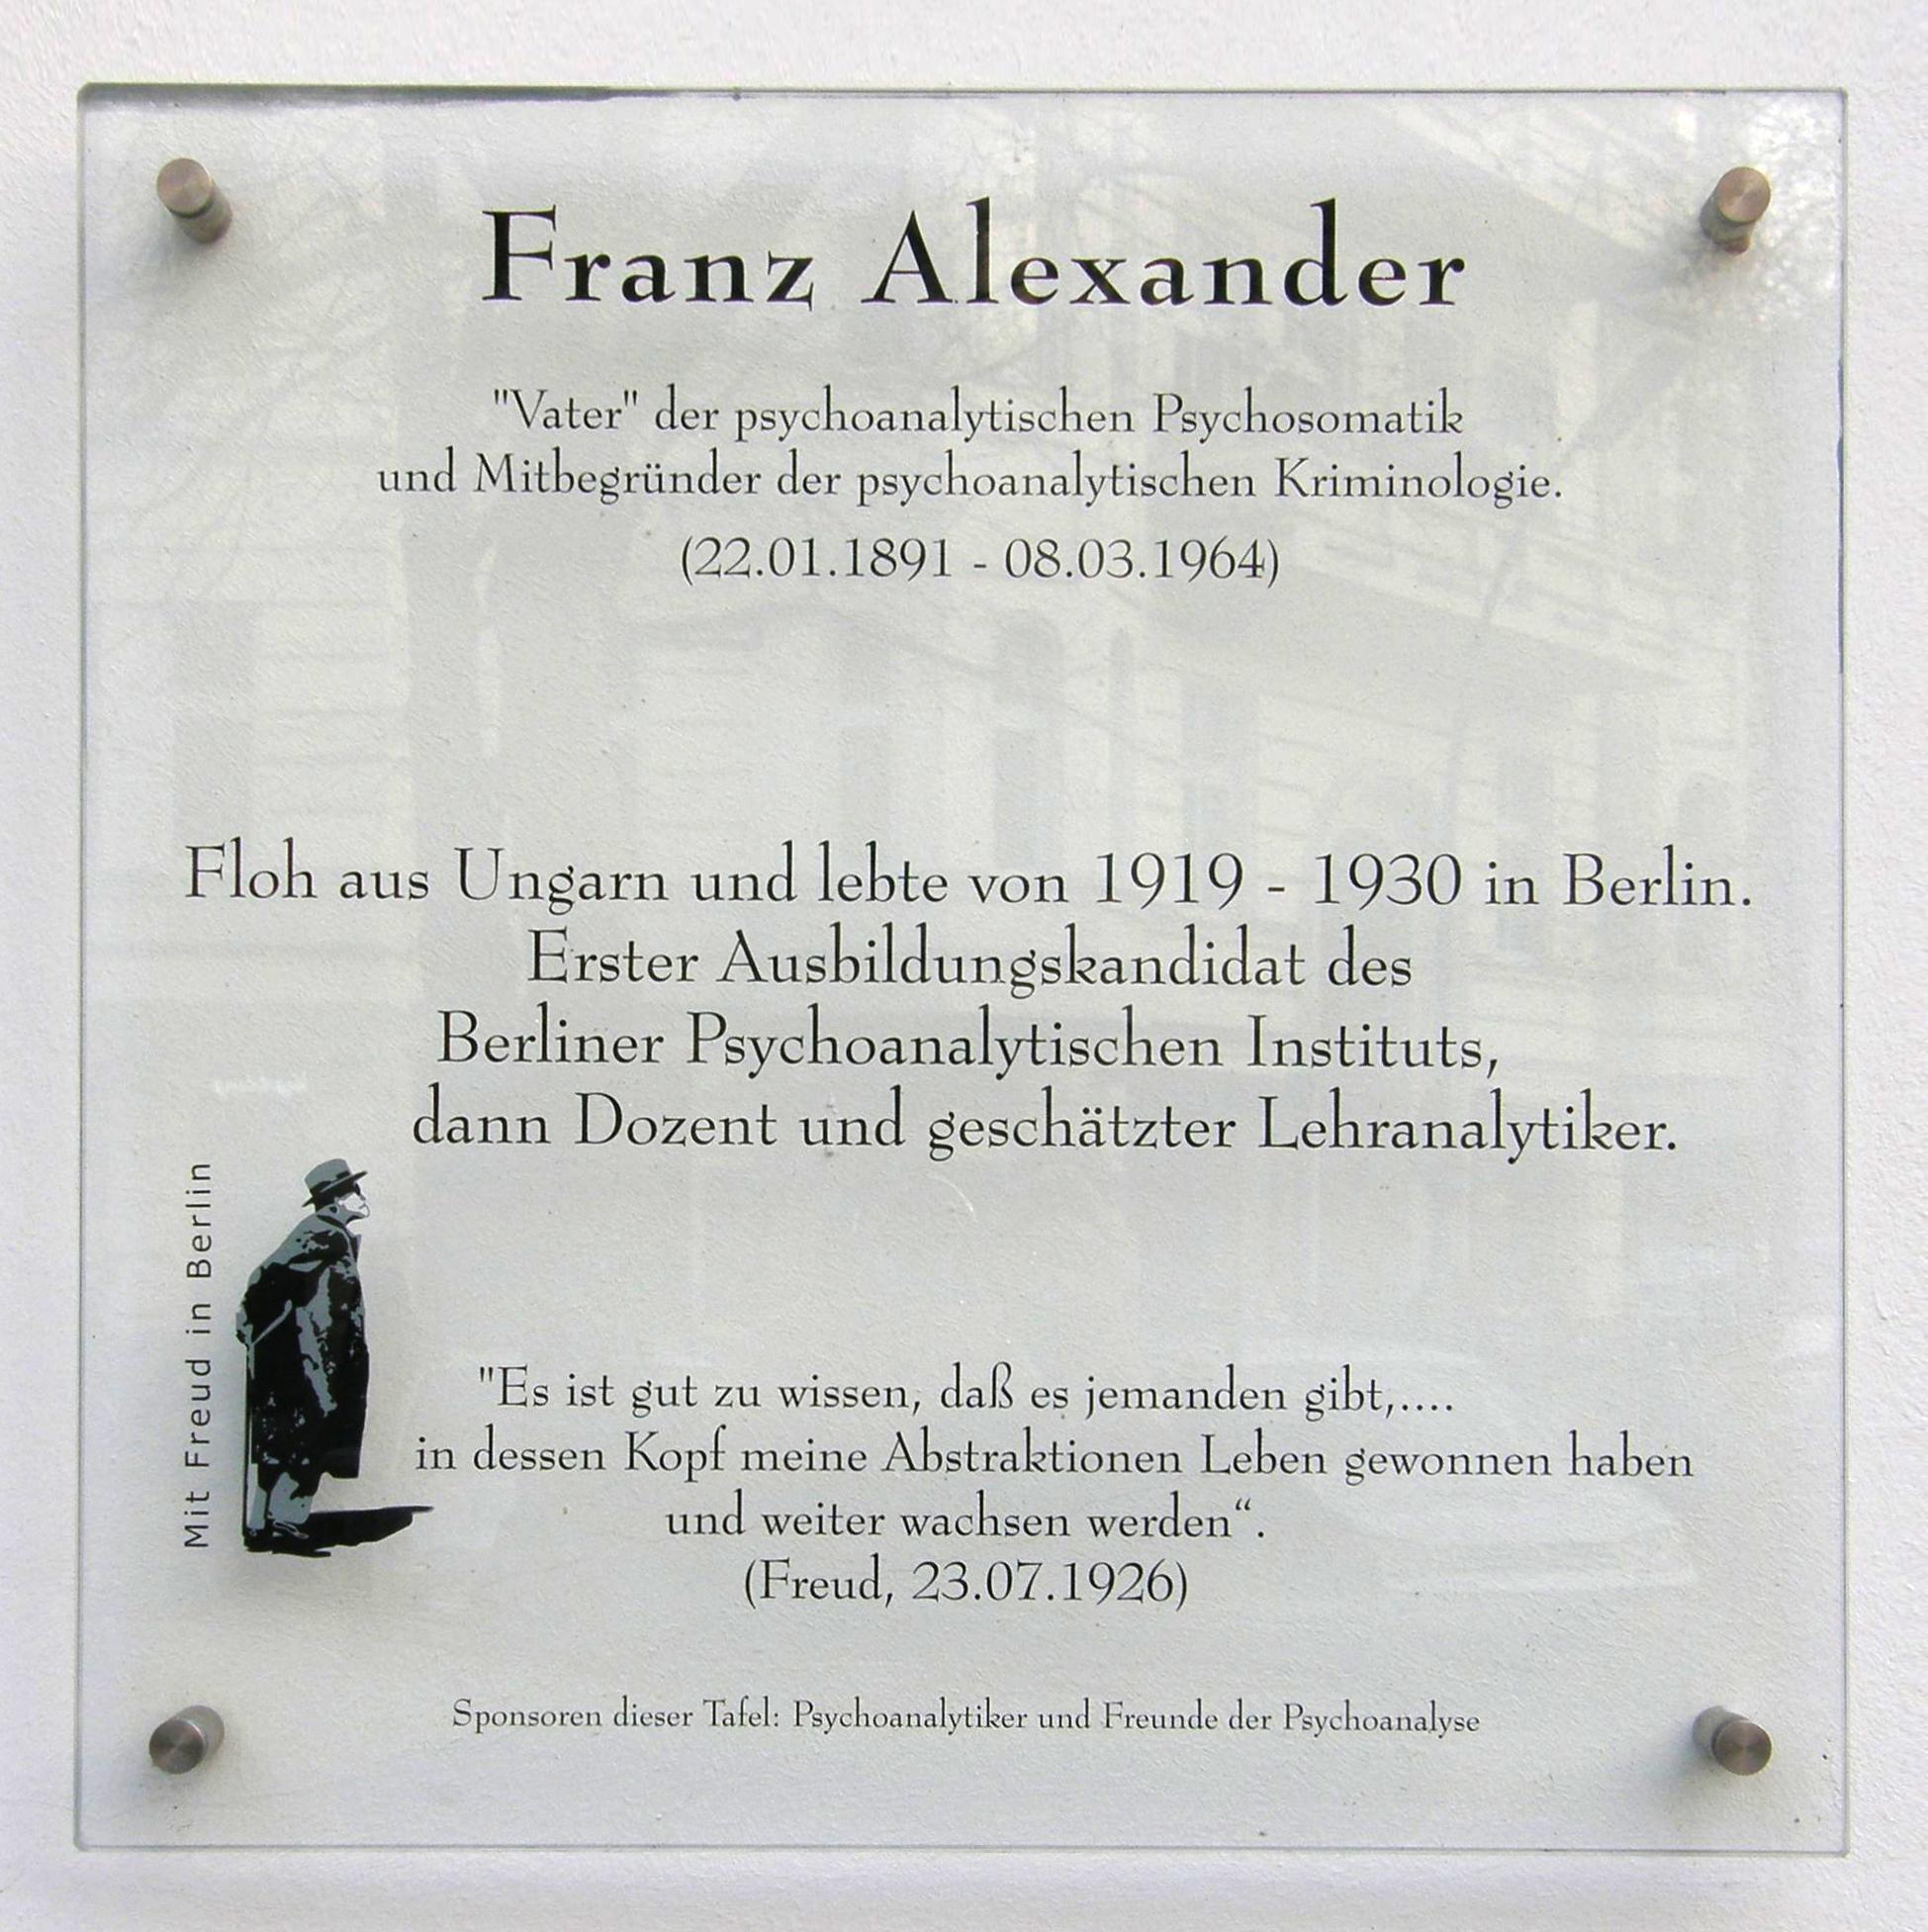 Memorial in the Ludwigkirchstraße, [[Berlin]]